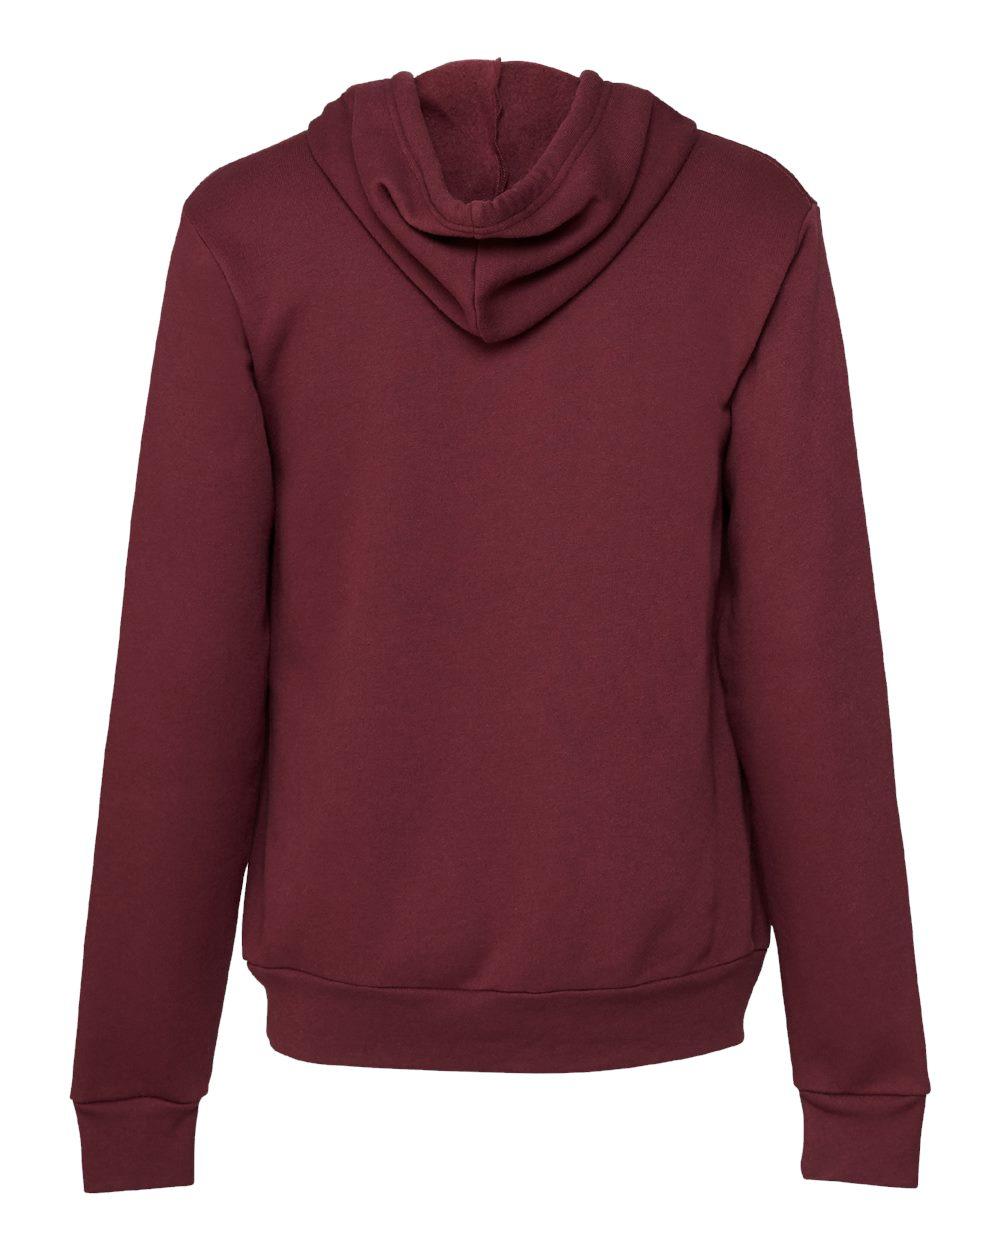 Bella-Canvas-Unisex-Sponge-Hooded-Pullover-Sweatshirt-Blank-3719-up-to-2XL thumbnail 72